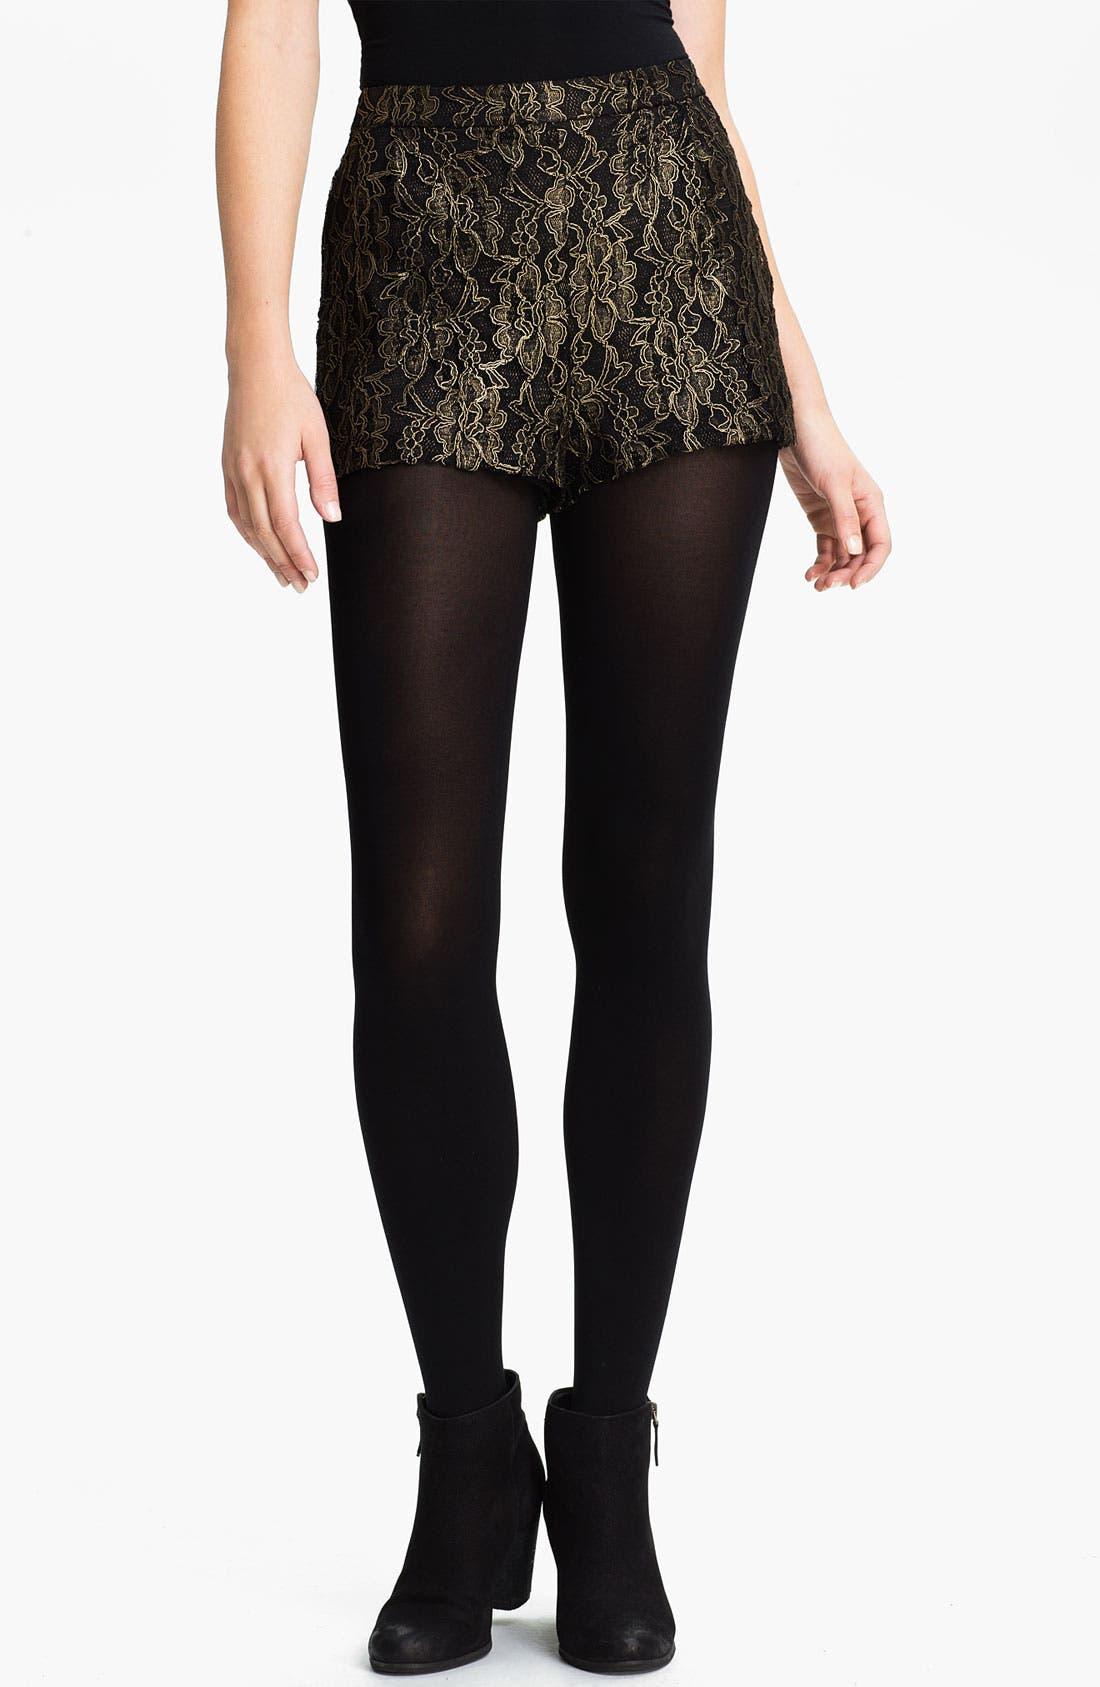 Alternate Image 1 Selected - Lush Lace Shorts (Juniors)